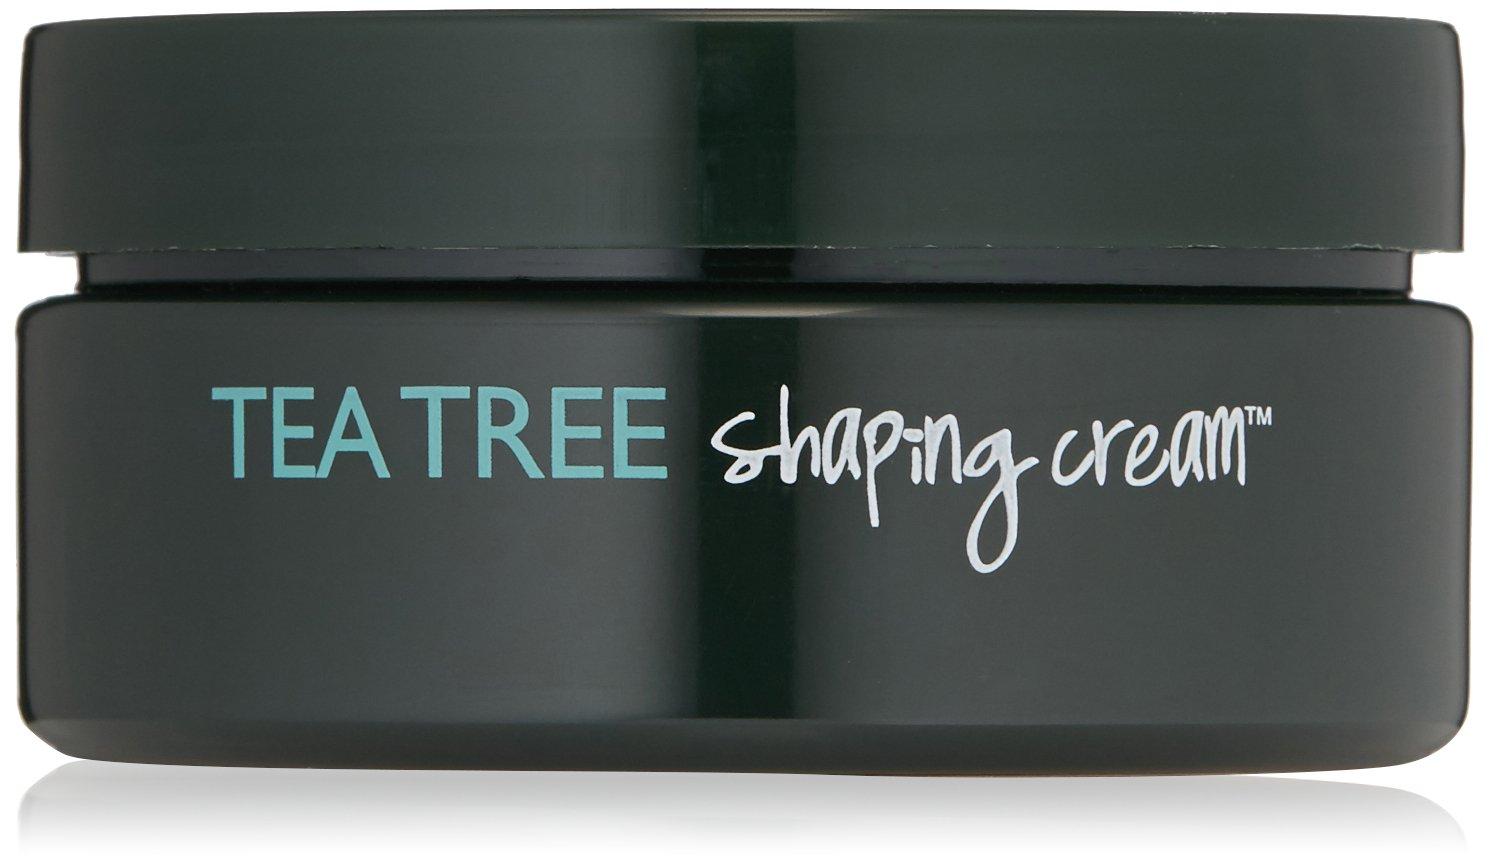 Tea Tree Shaping Cream, 3.0 Fl Oz by Tea Tree